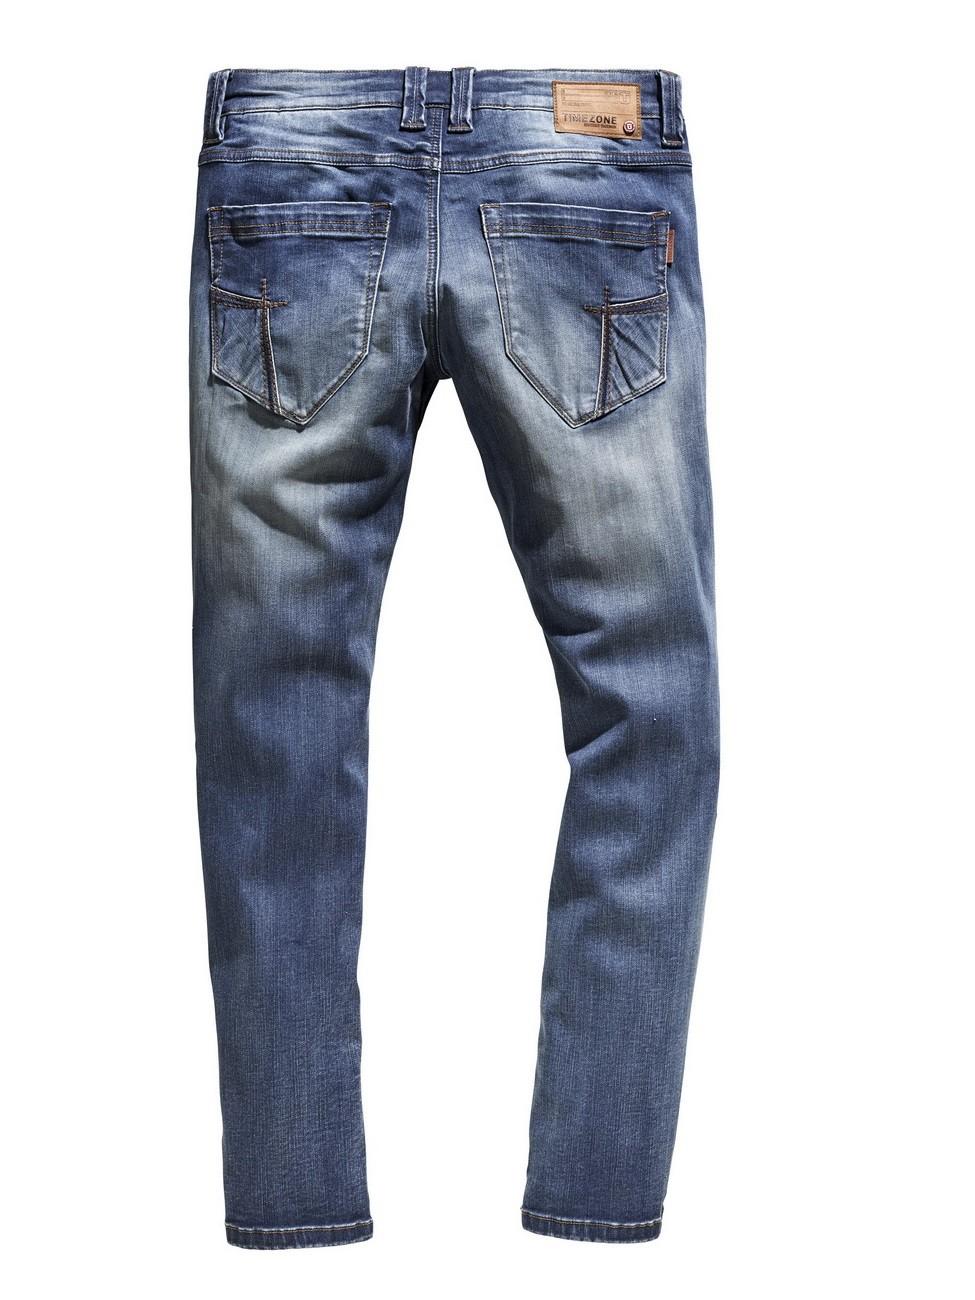 timezone herren jeans eduardotz zip slim fit blau. Black Bedroom Furniture Sets. Home Design Ideas